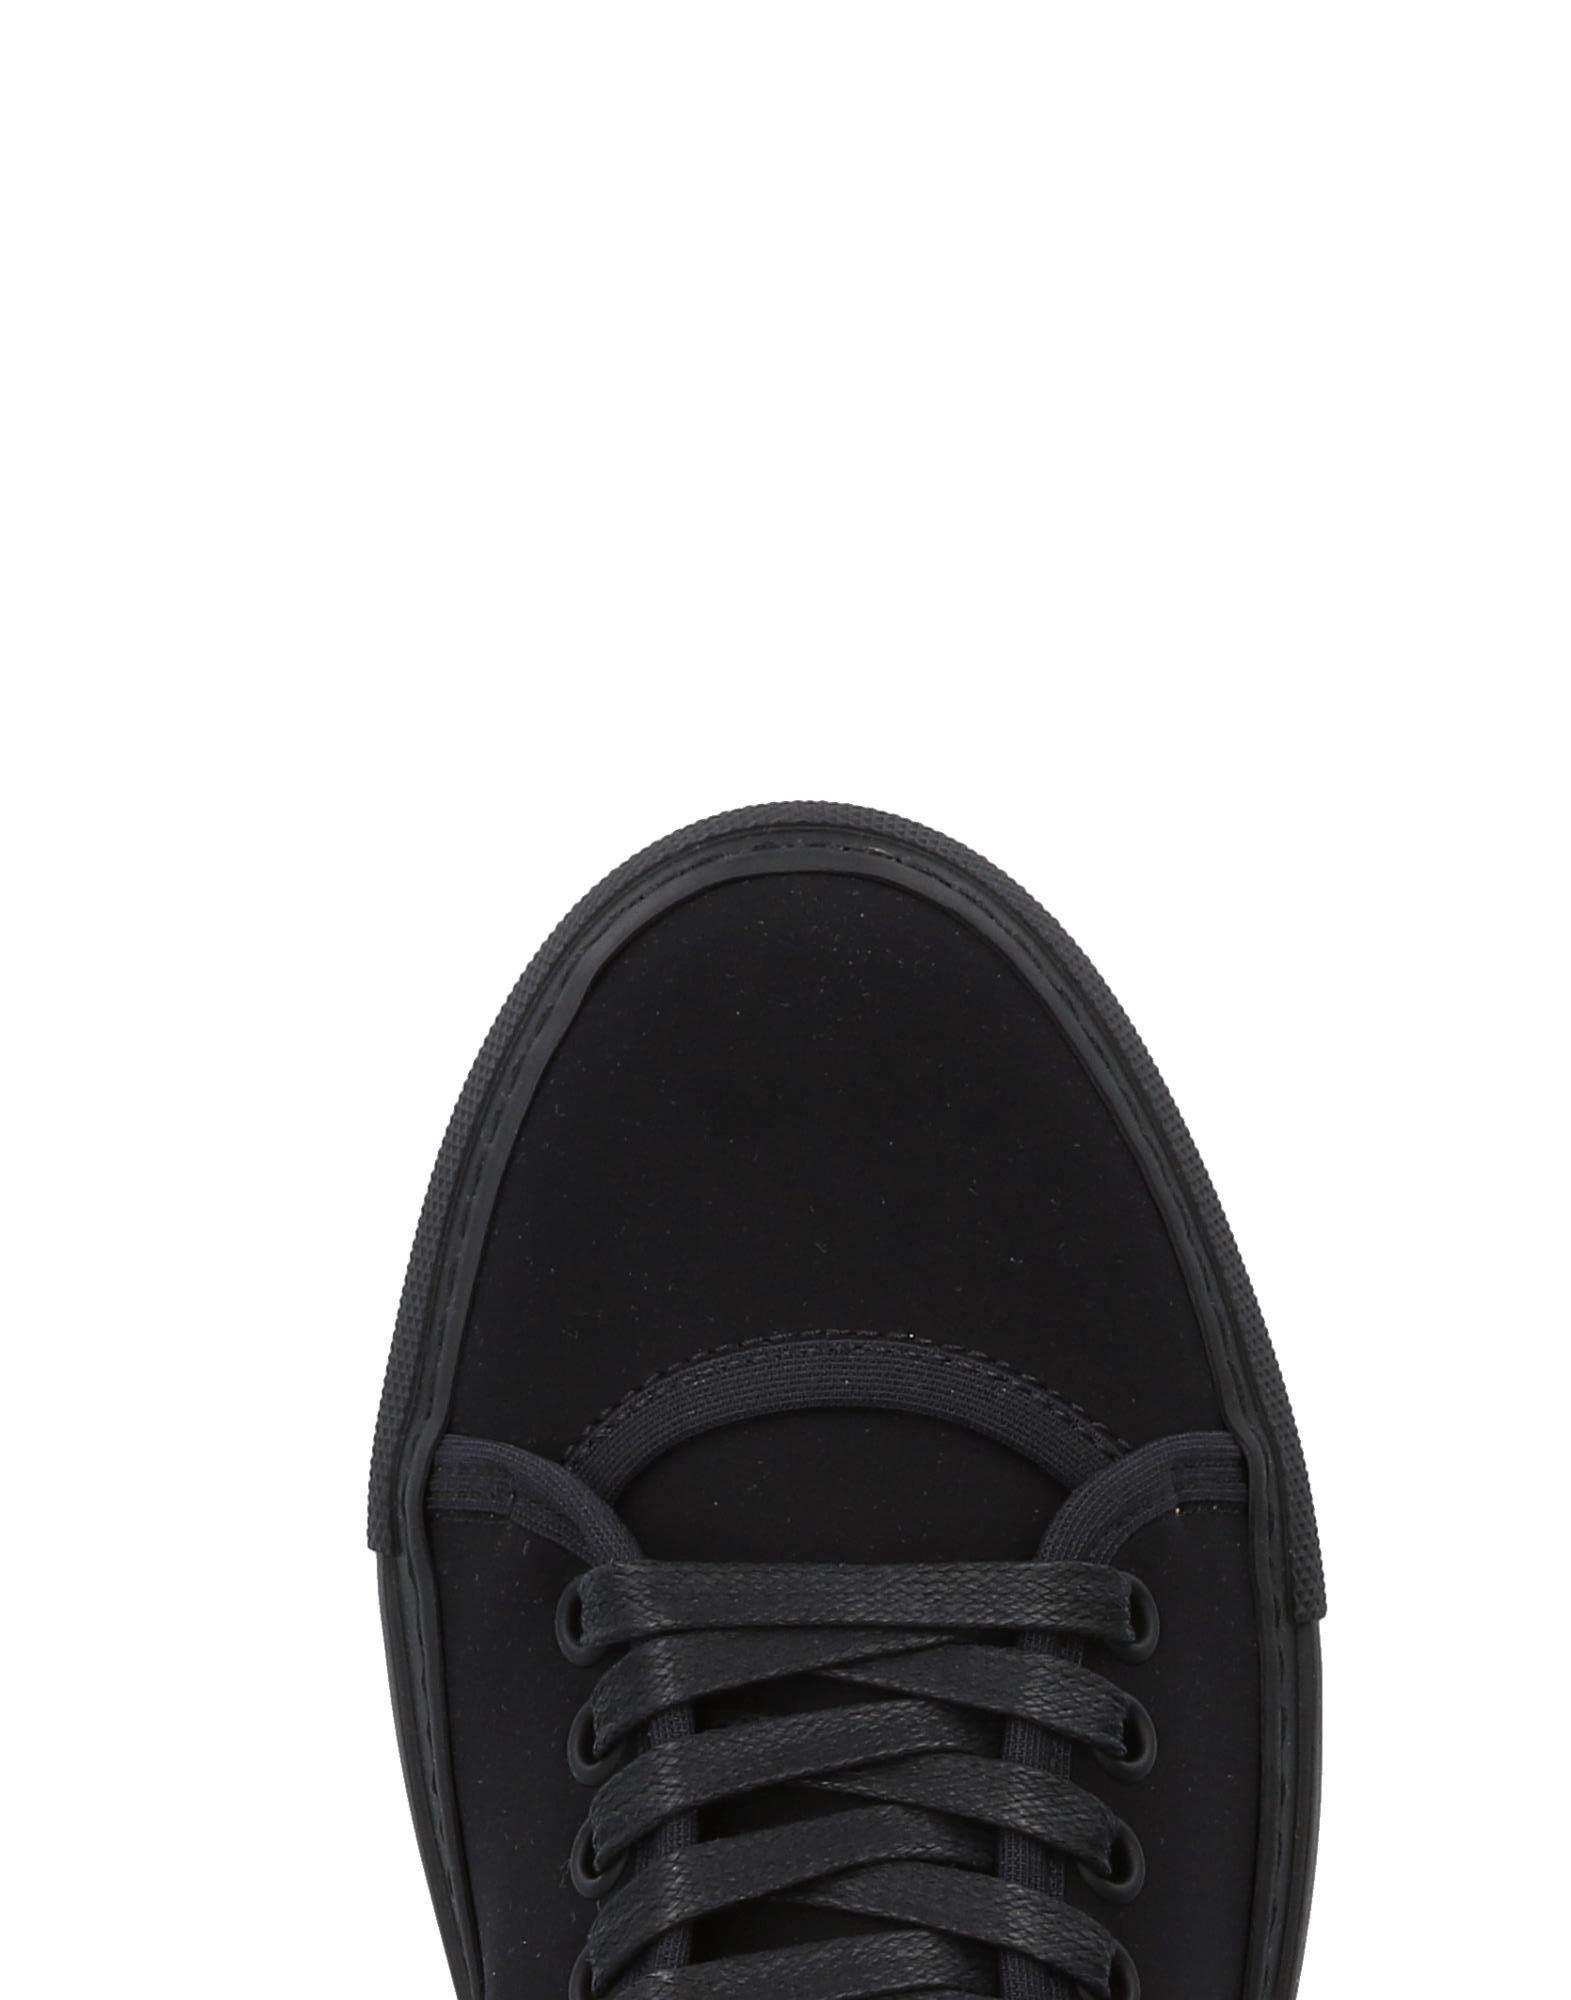 Sneakers Buscemi Femme - Sneakers Buscemi sur